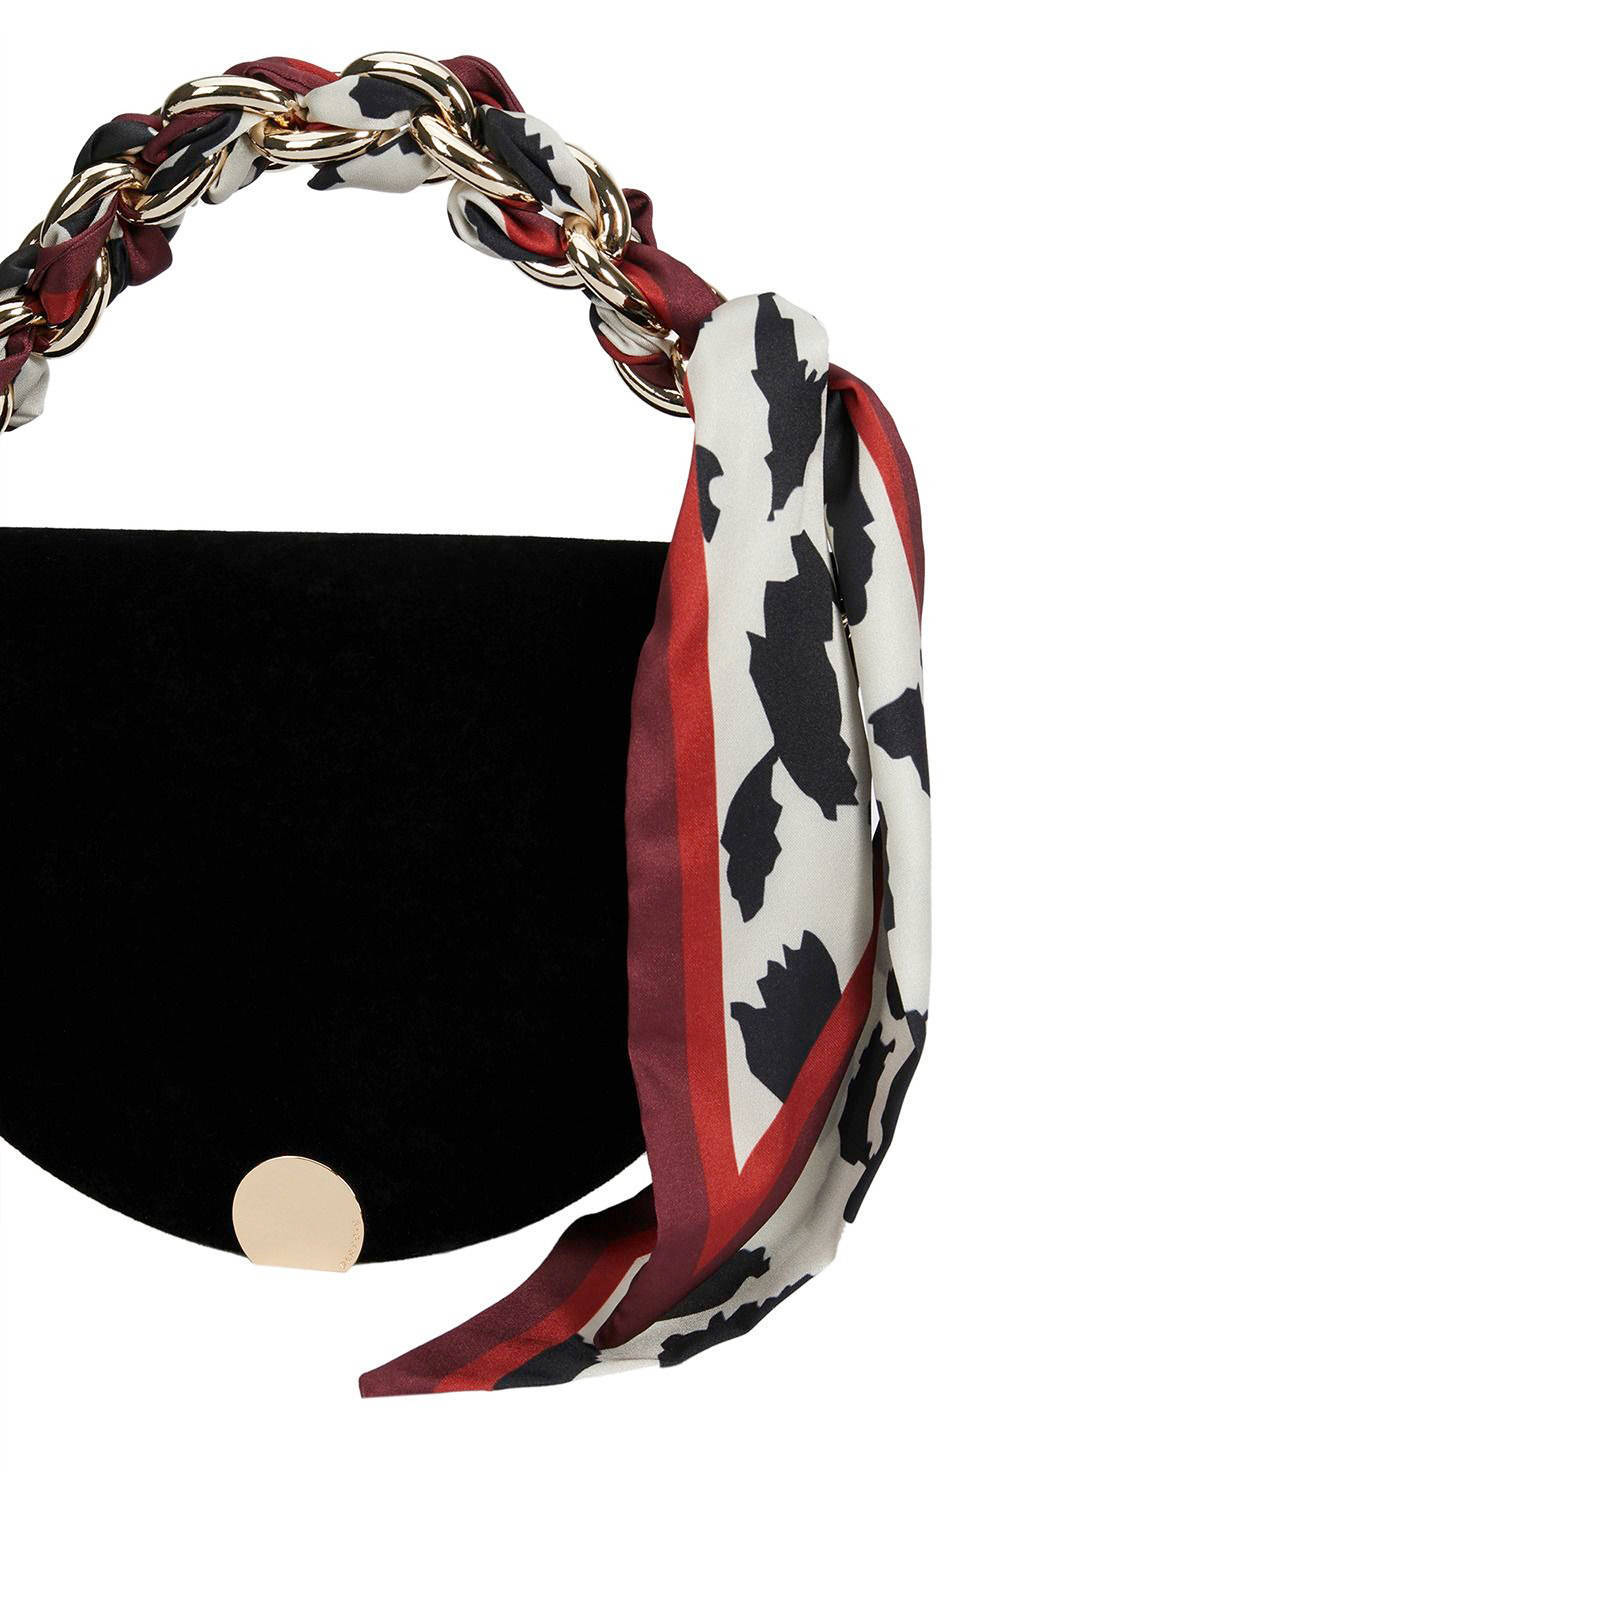 pre-order nieuwe lagere prijzen lage prijs Parfois Zwart Crossbody Tas Tassen f6ybg7Y